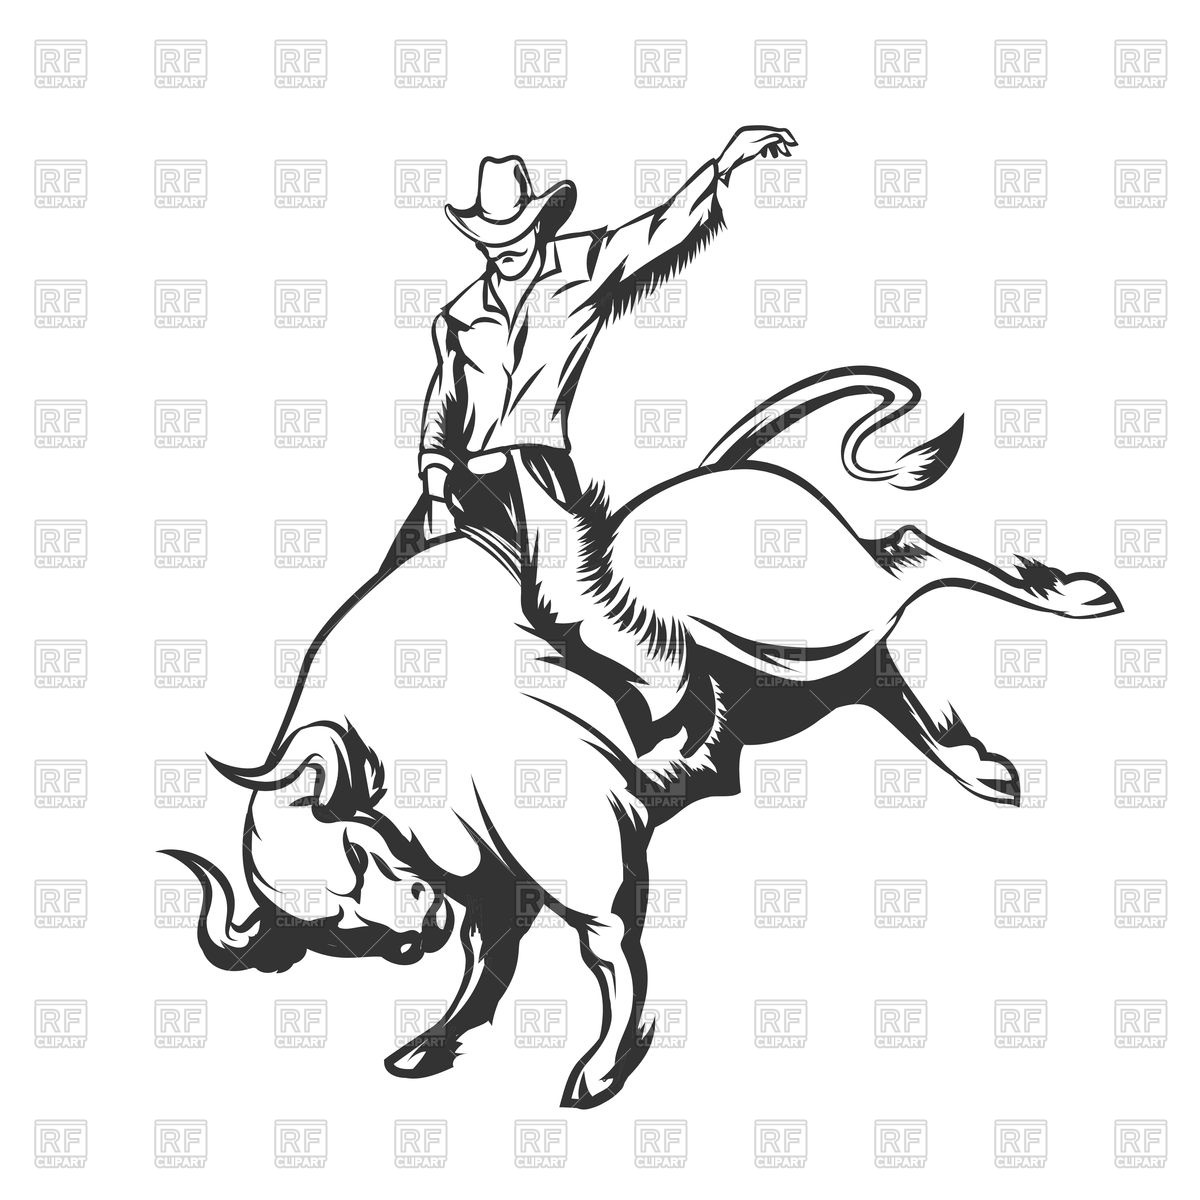 Rodeo cowboy riding wild bull Stock Vector Image.